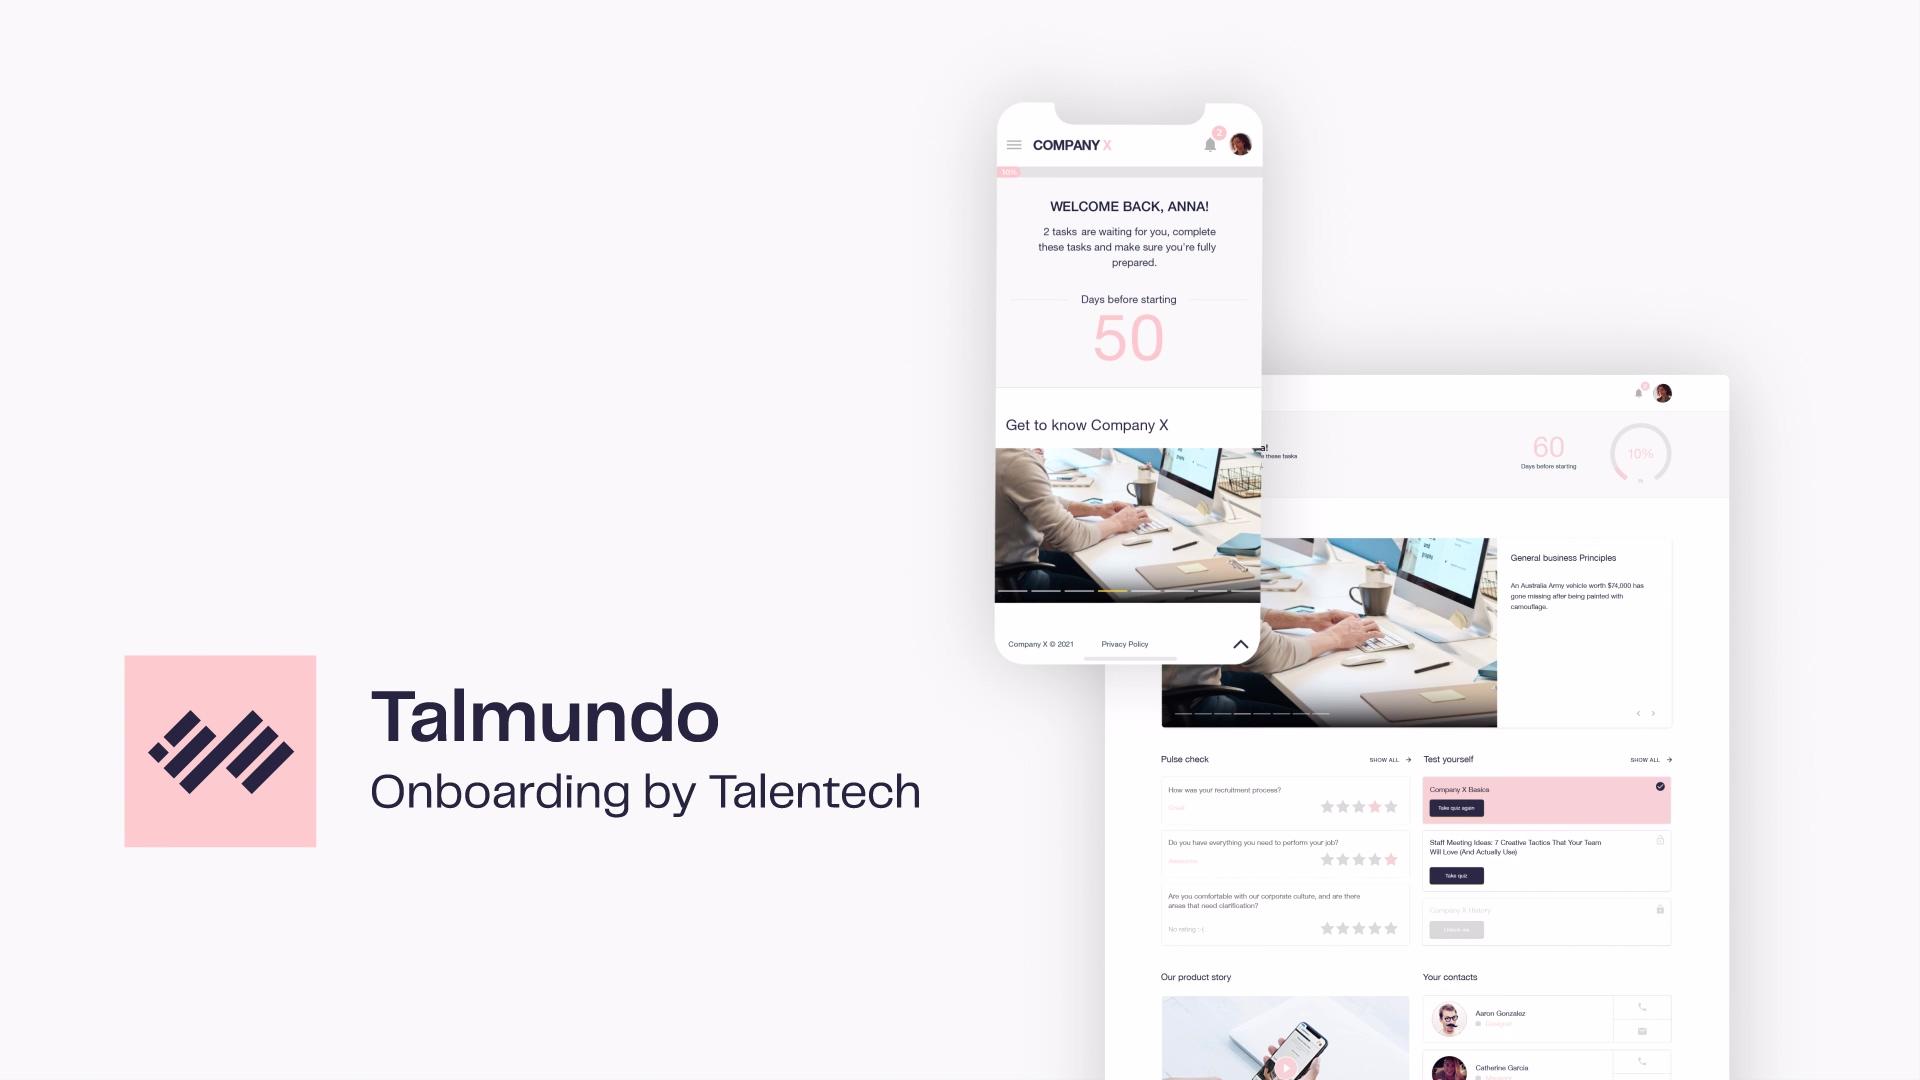 Talmundo 2021 Product Video